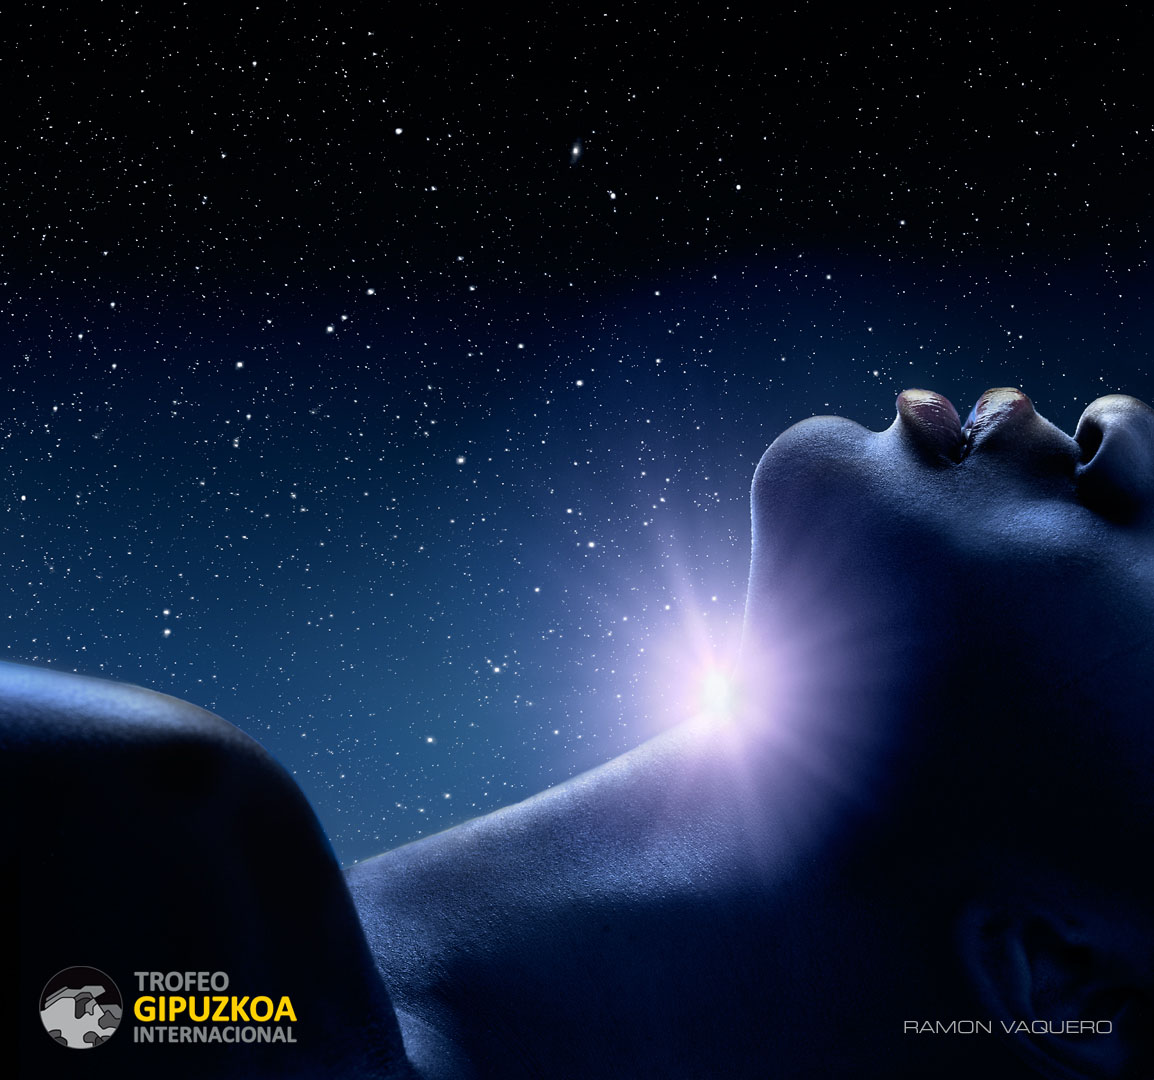 Stars-Time_ramon-vaquero_trofeo-gipuzkoa